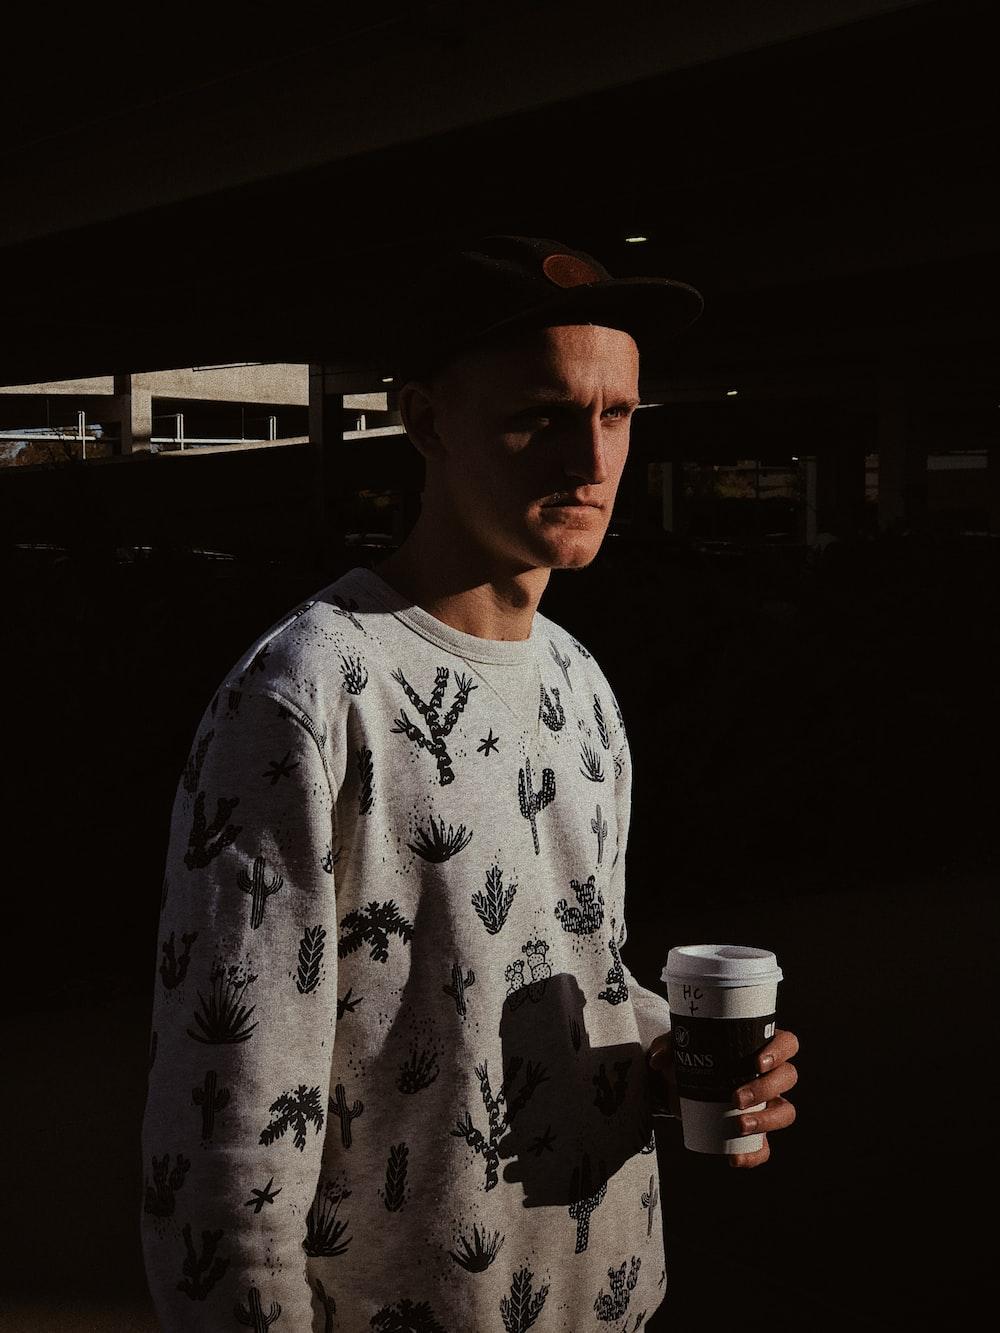 man wearing grey sweatshirt holding cup